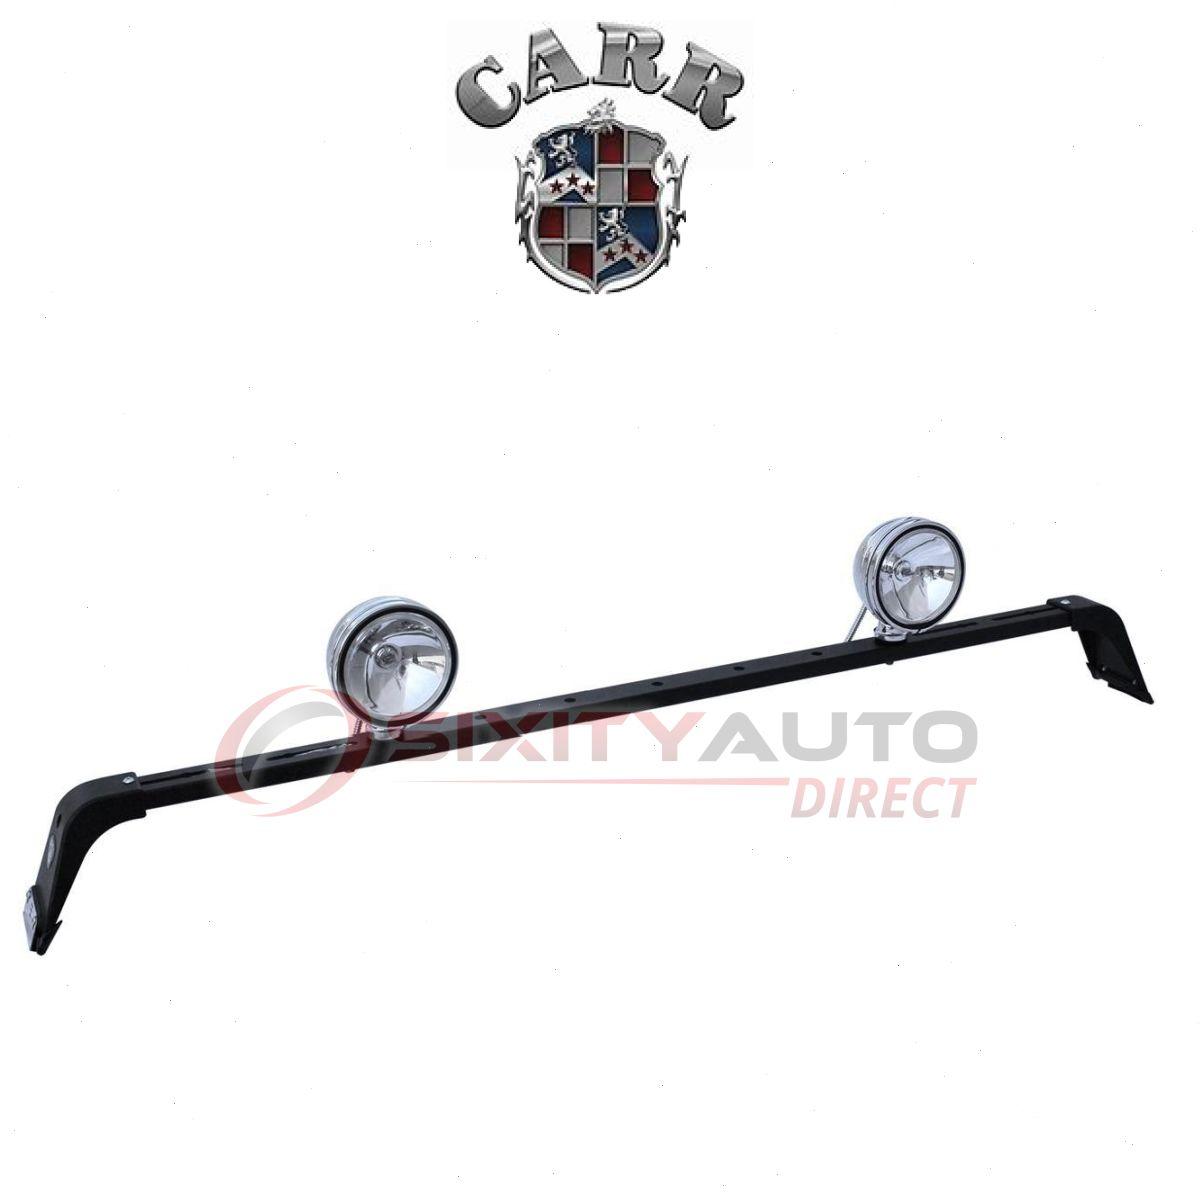 Carr Light Bar For Nissan Frontier